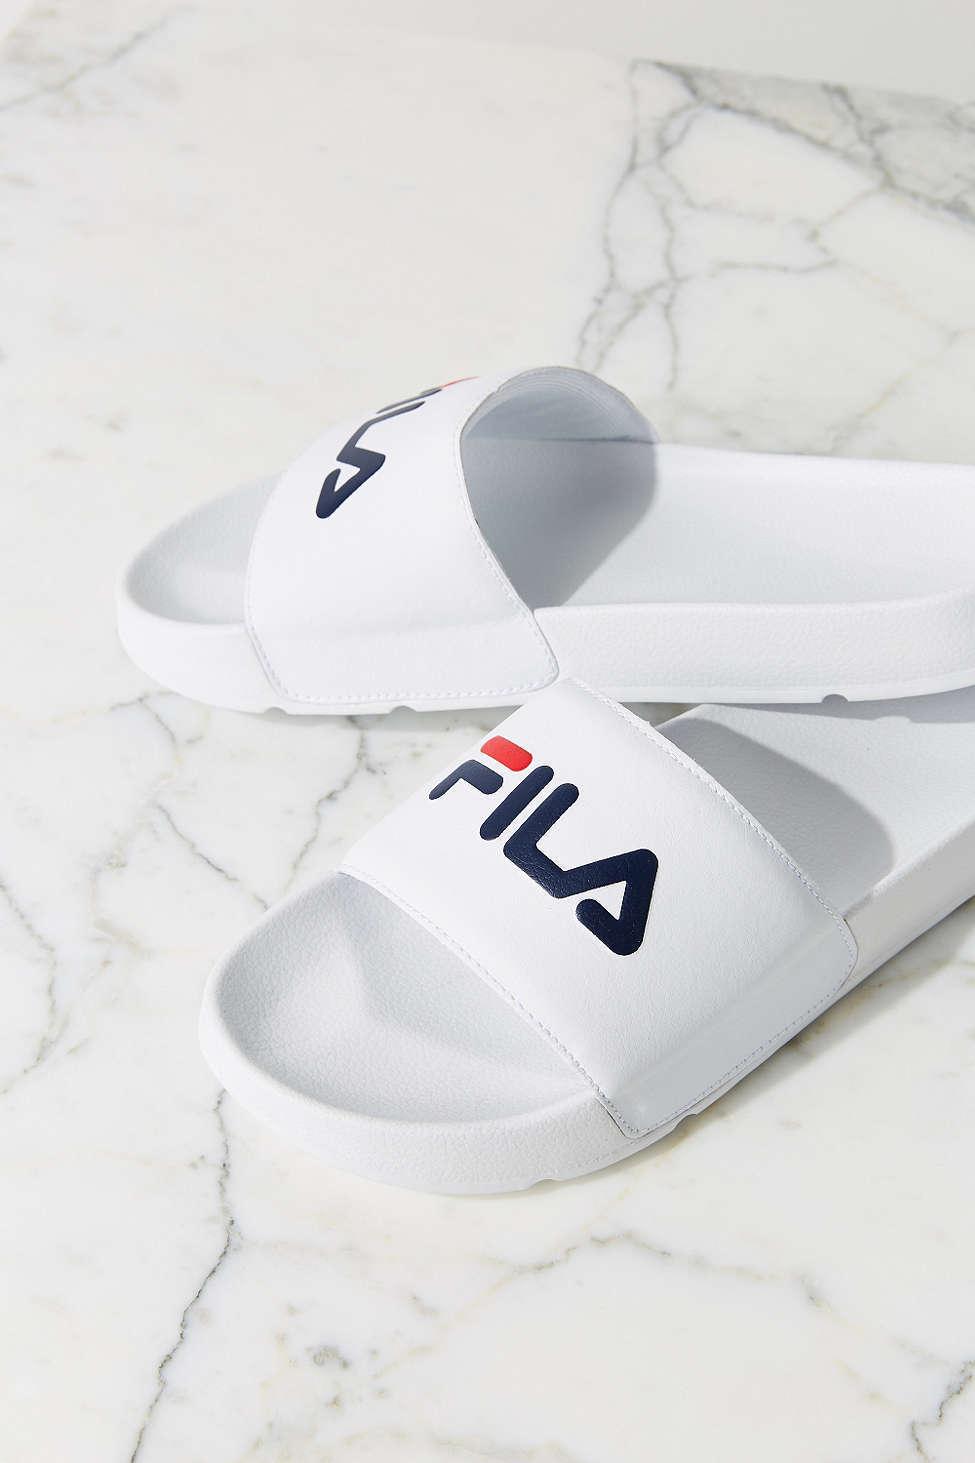 new fila swimming pool slide sandals buyma. Black Bedroom Furniture Sets. Home Design Ideas